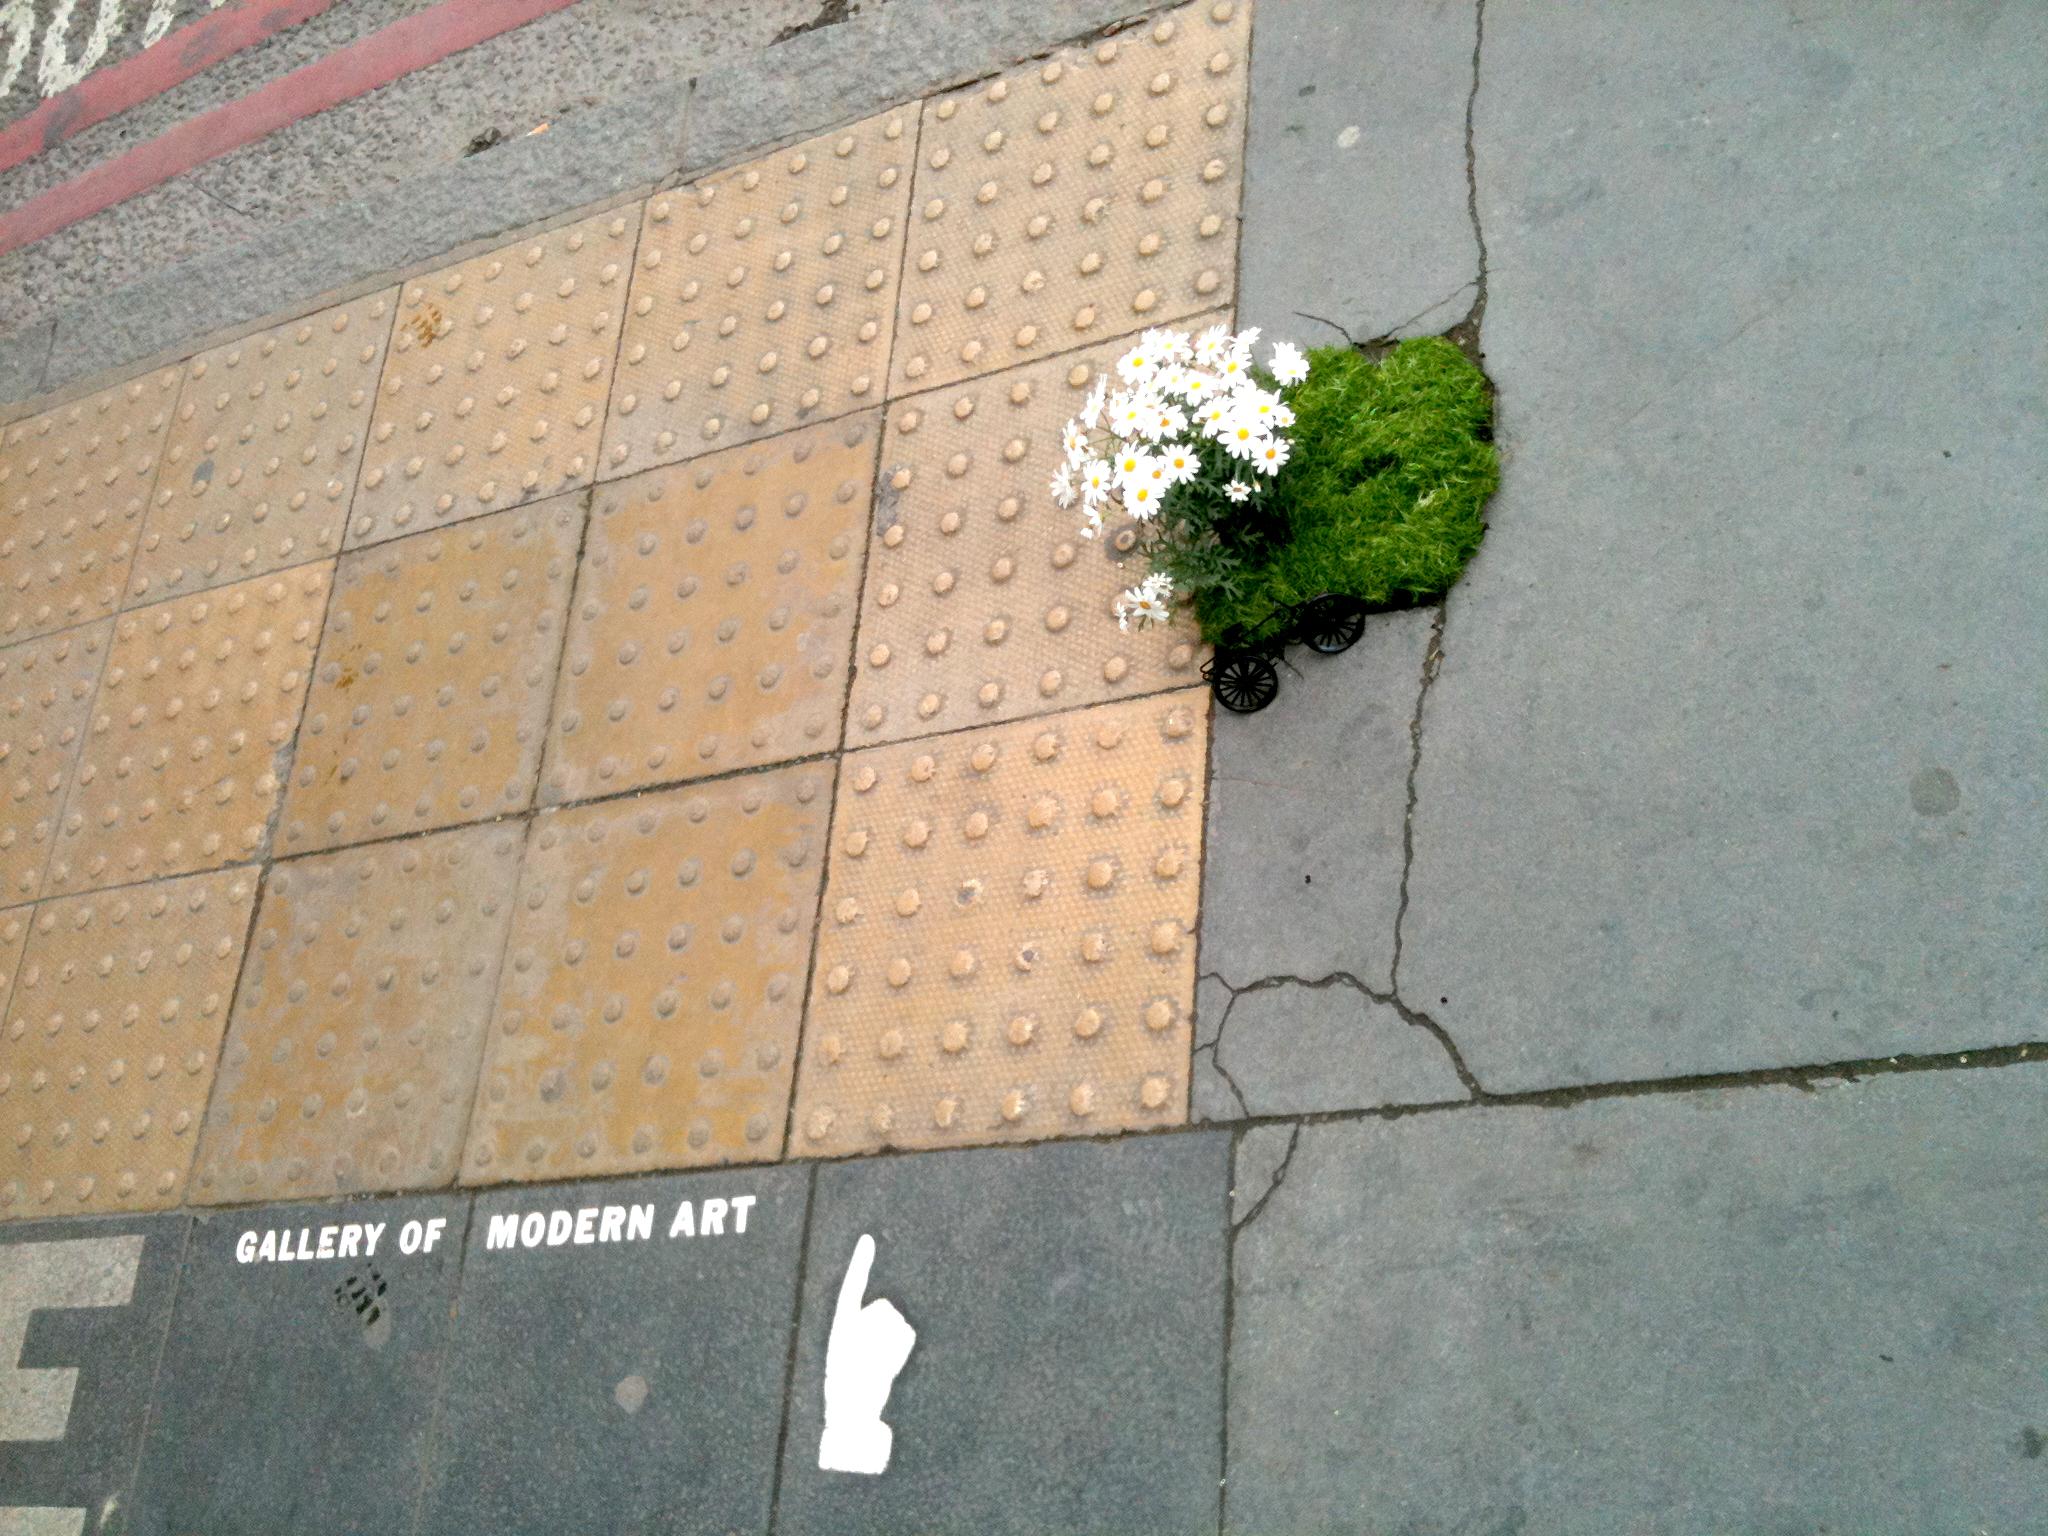 pothole garden bike south london mini garden road steve wheen people looking daisy this way for modern art